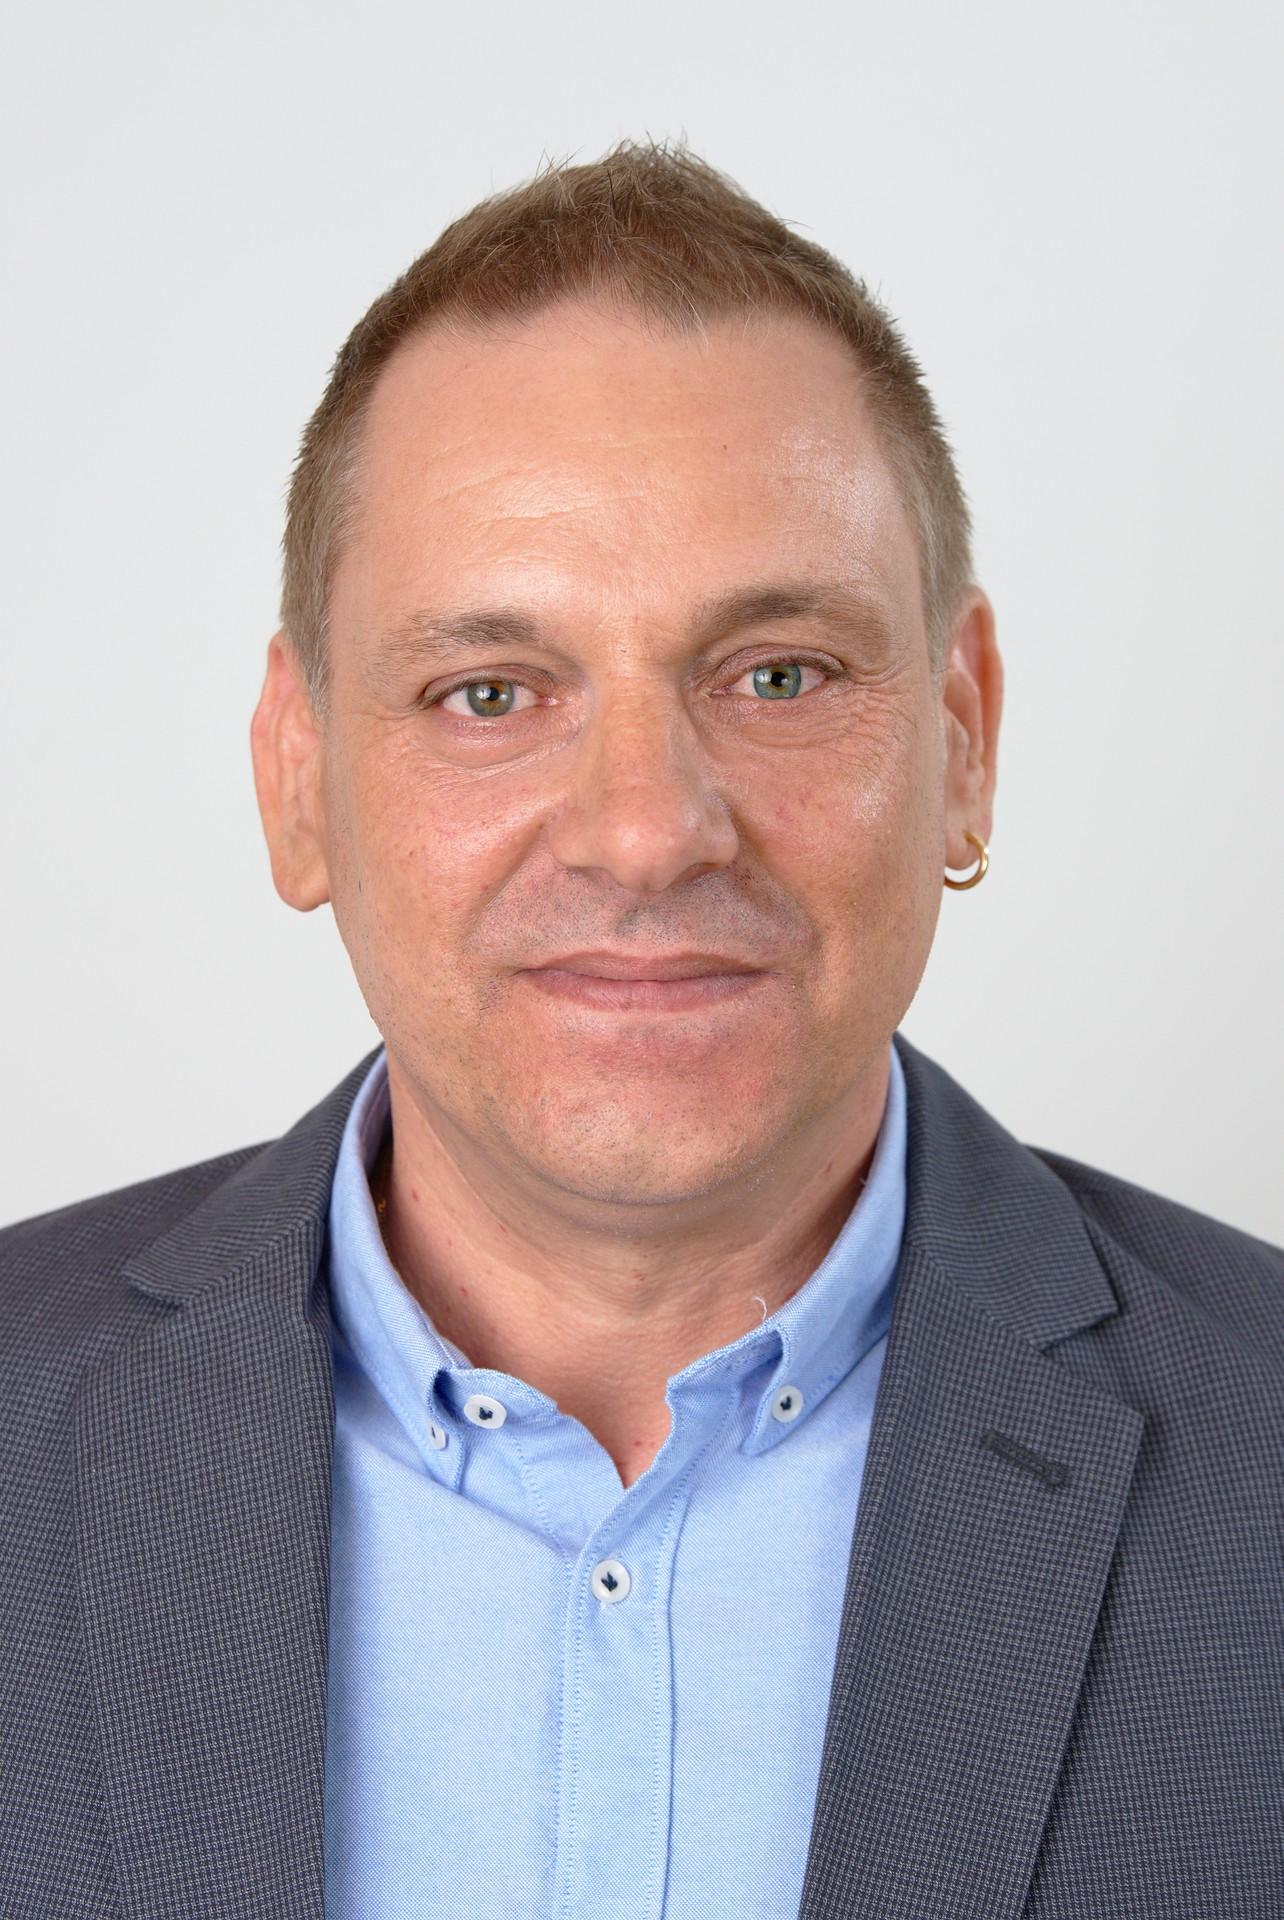 Thomas Schatz